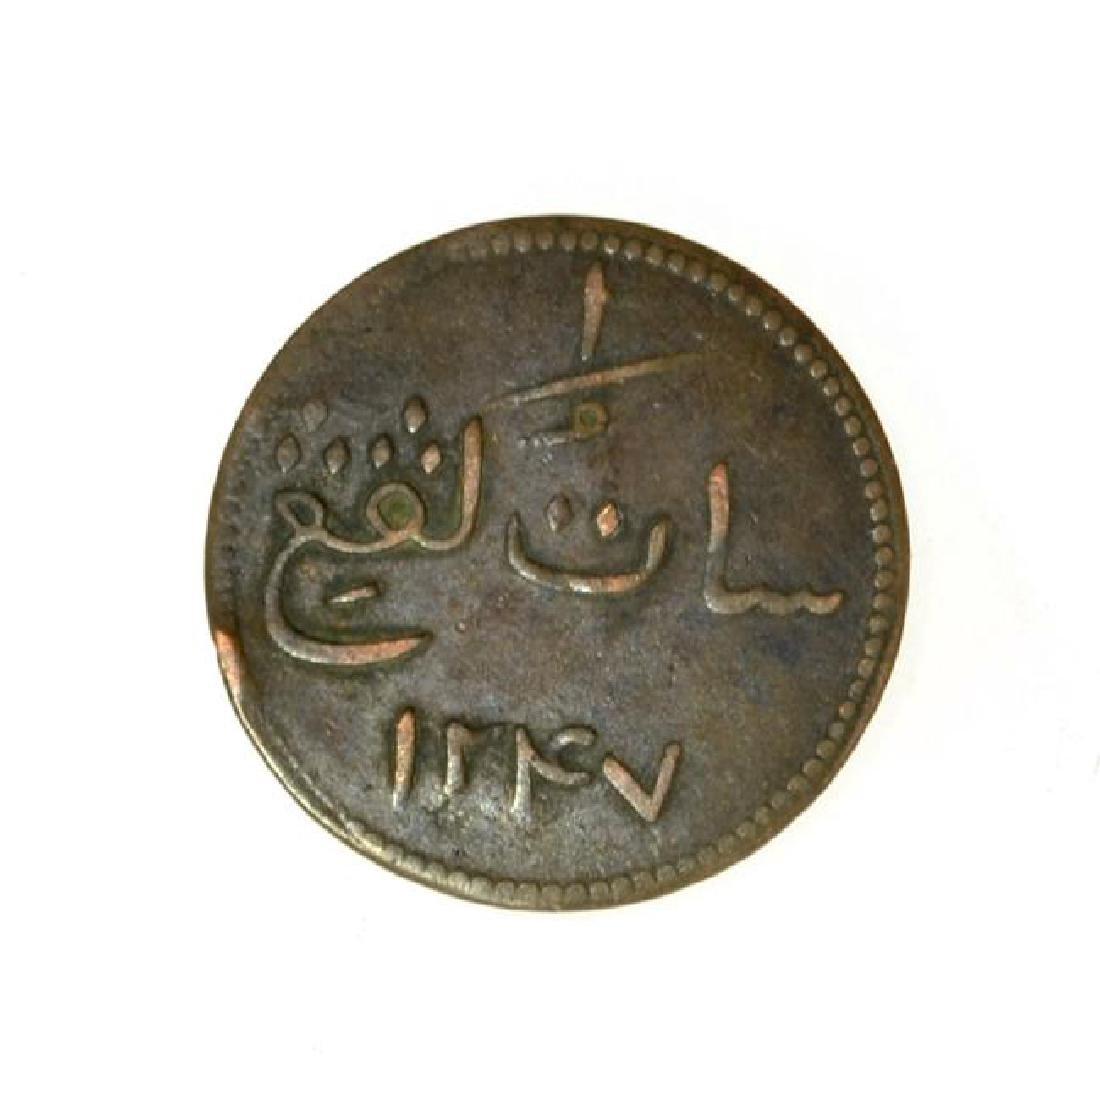 British Colonial Malaysia Coin (JG) - 2